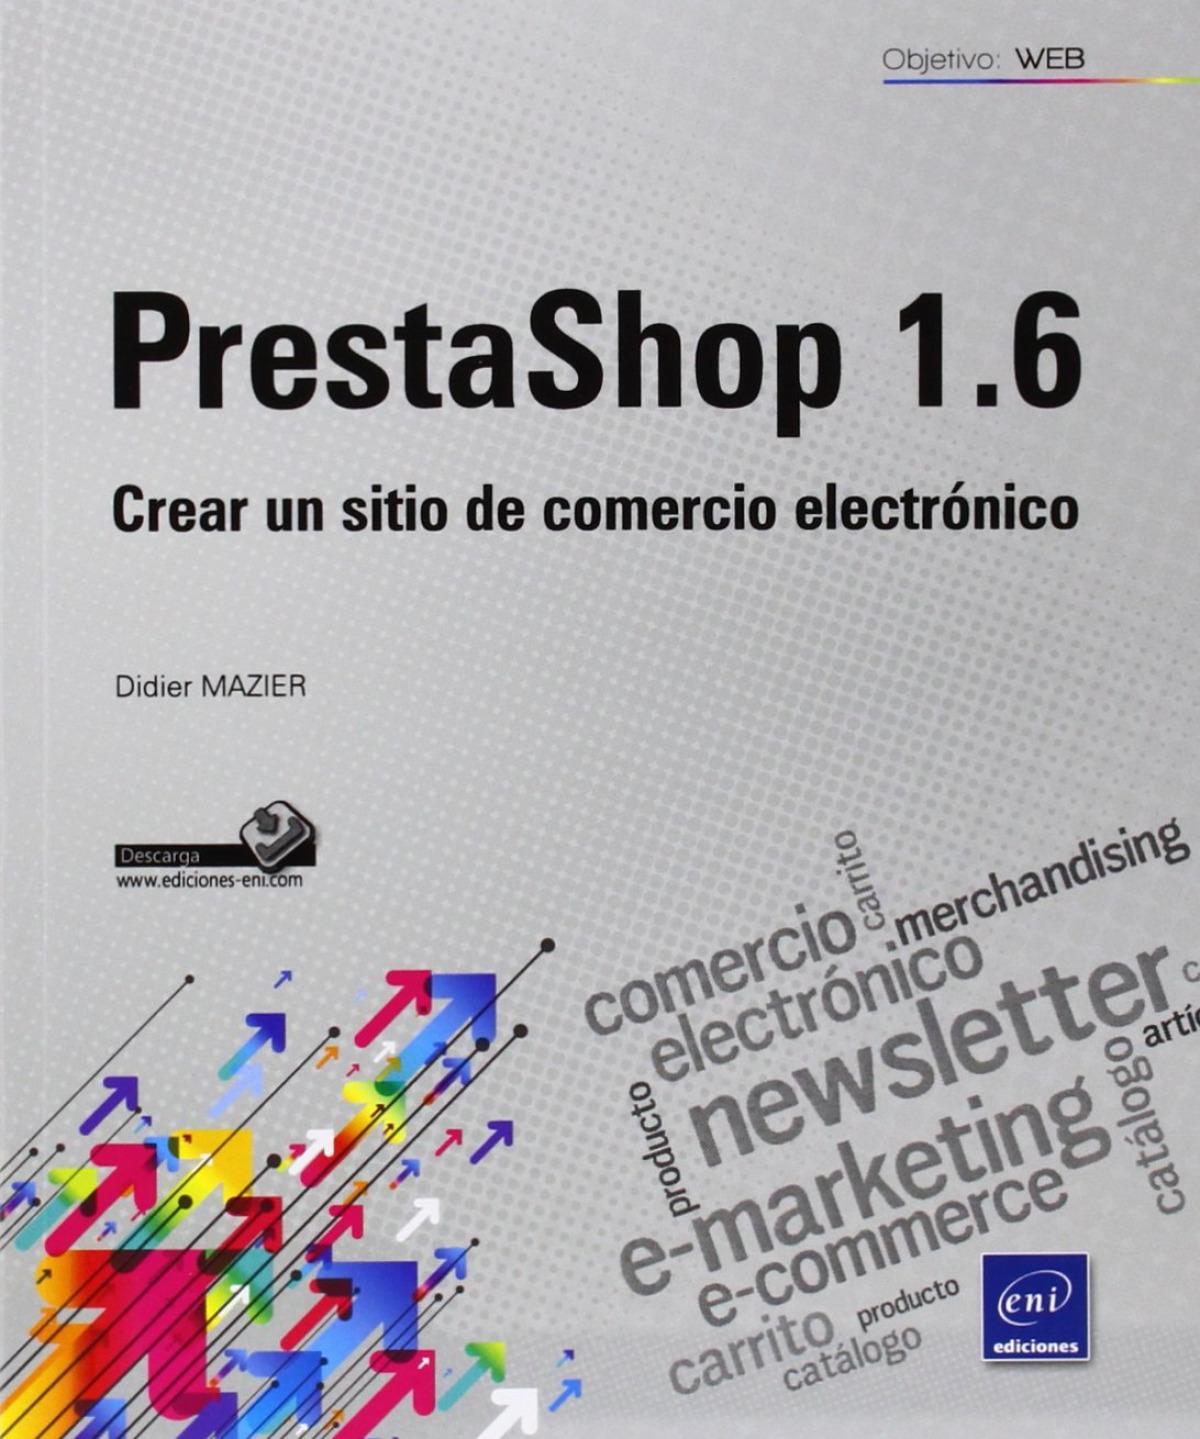 Objetivo: Web Prestashop 1.6